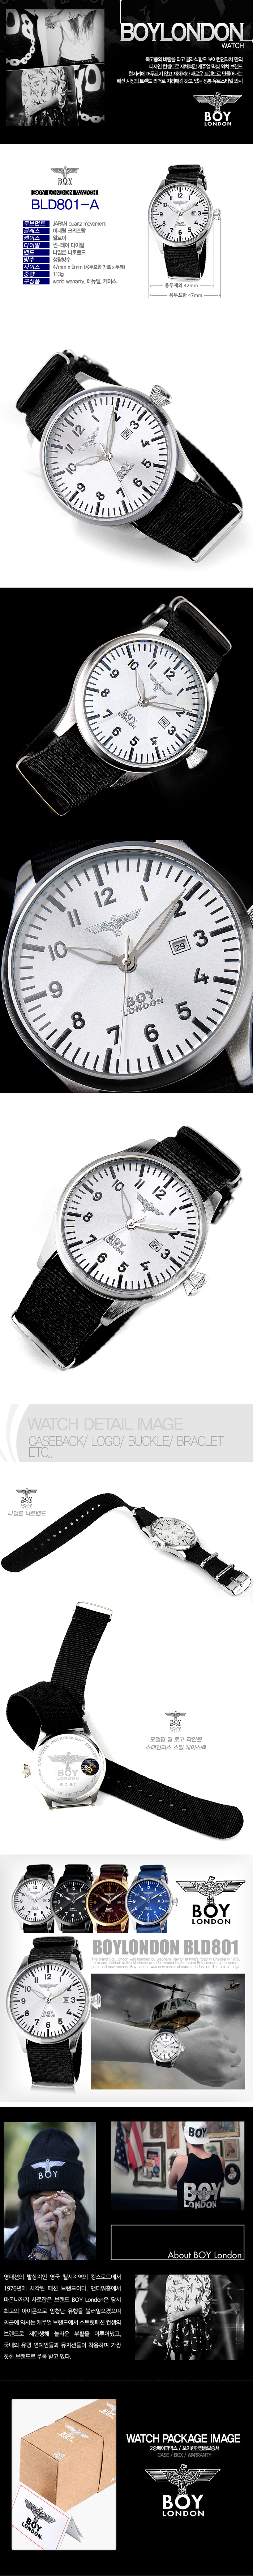 [BOY LONDON]보이런던 시계 오버사이즈 BLD801-A 나토밴드 본사정품